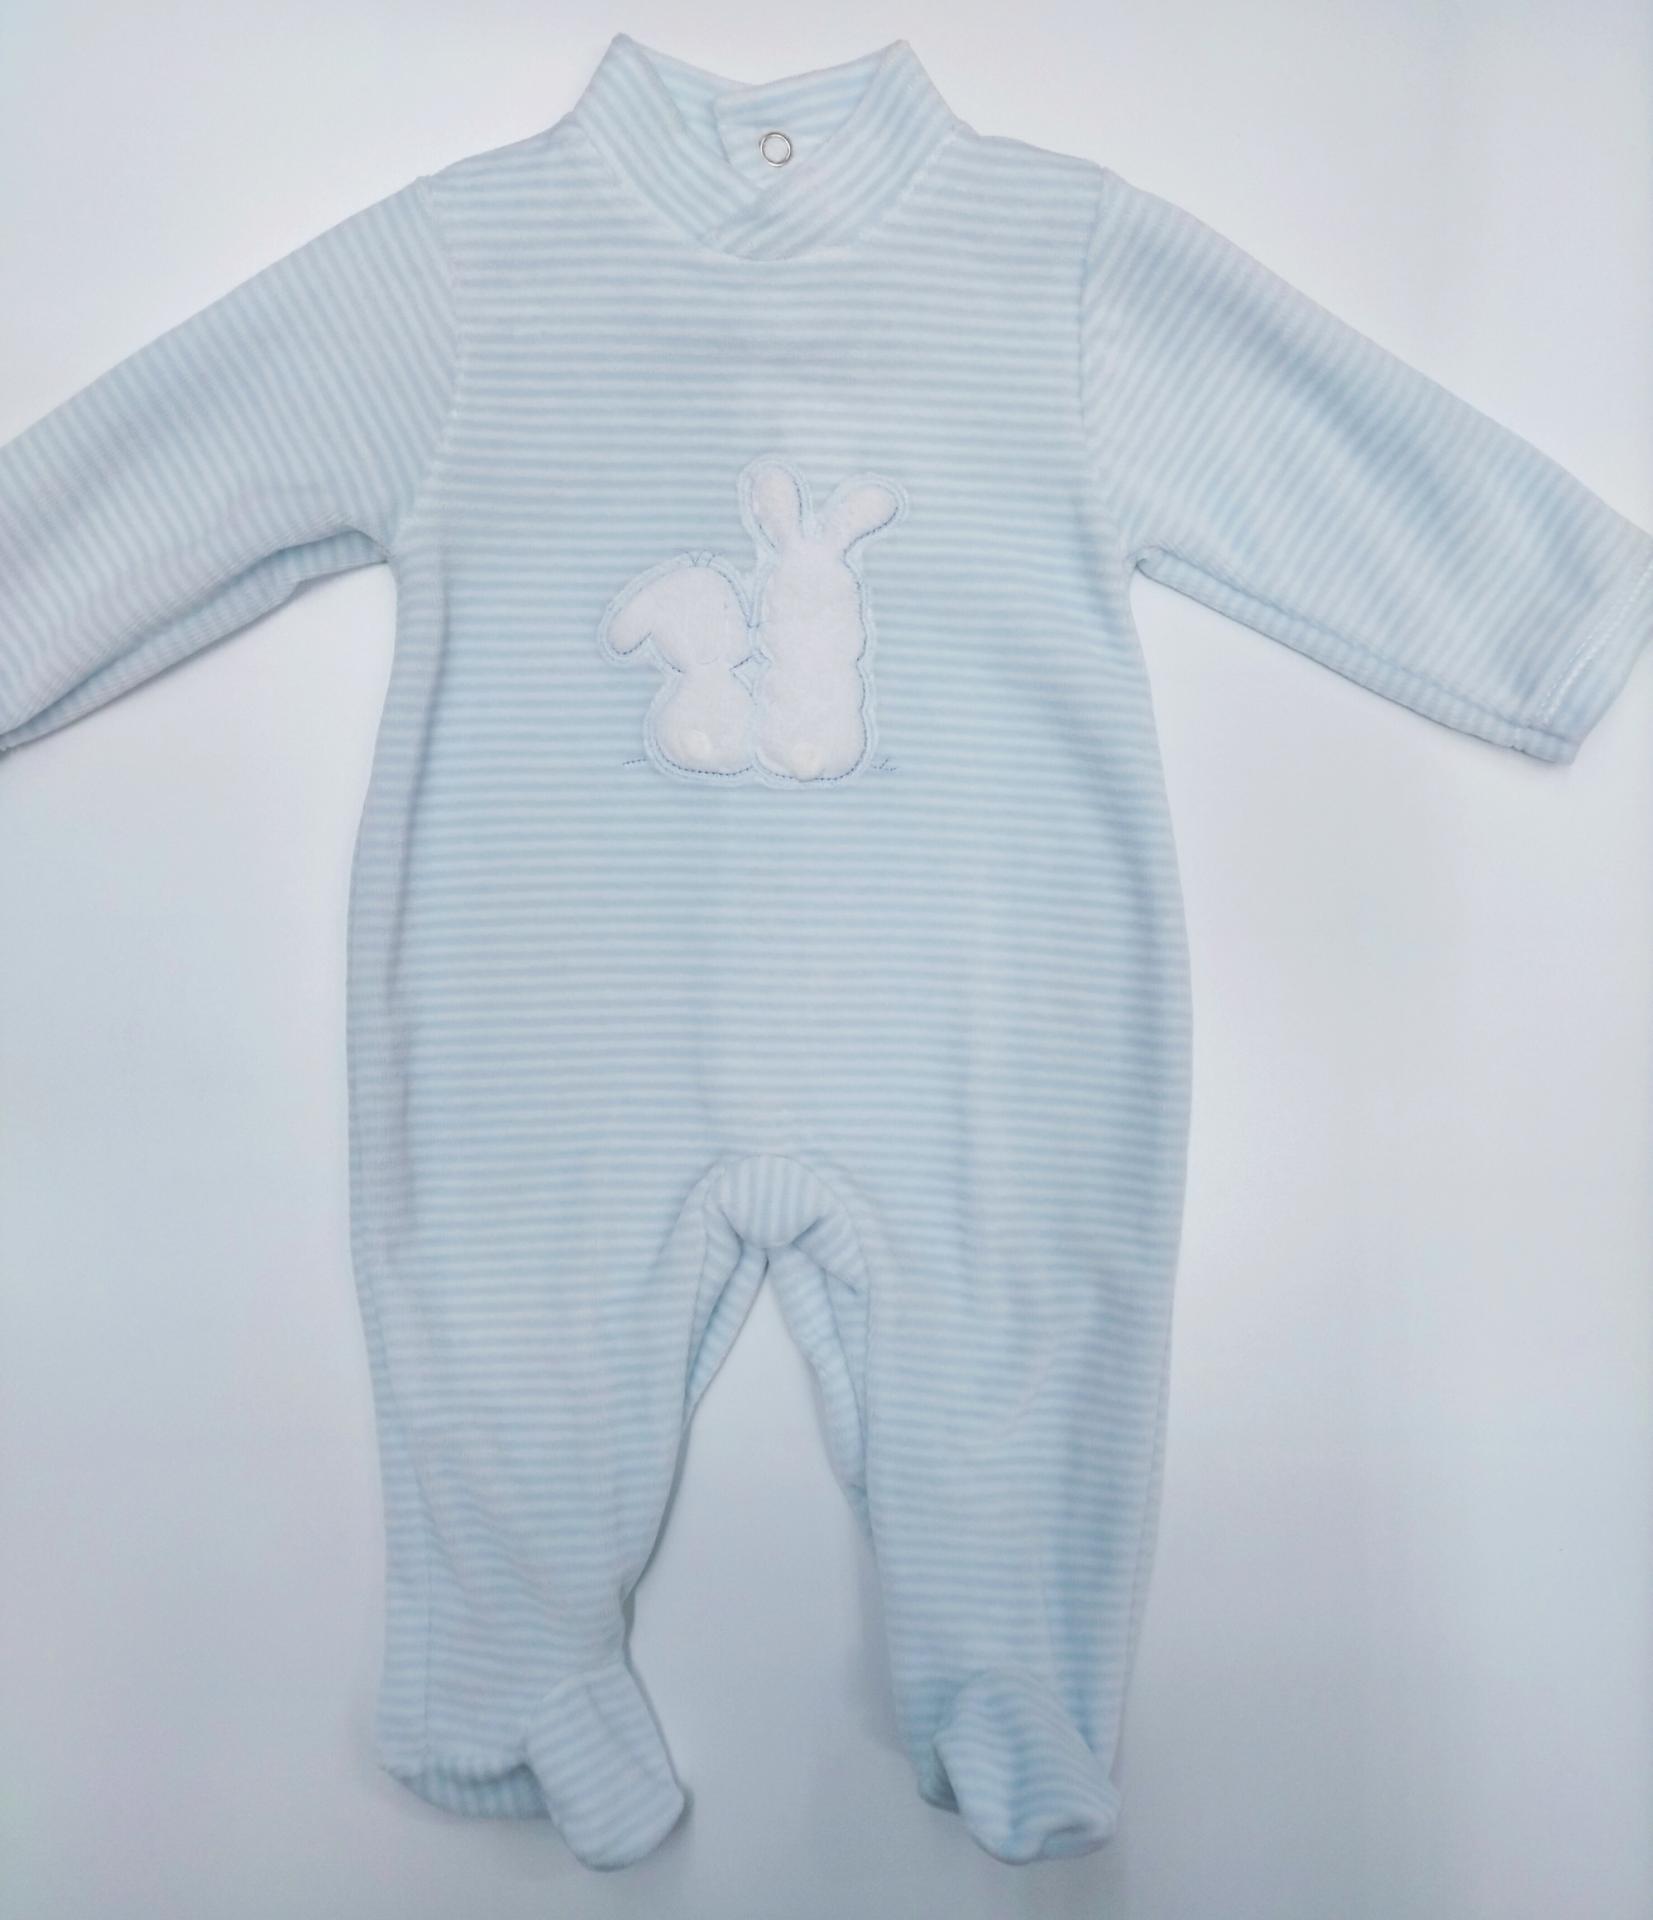 Pijama bebé rayas Conejo de Deolinda.